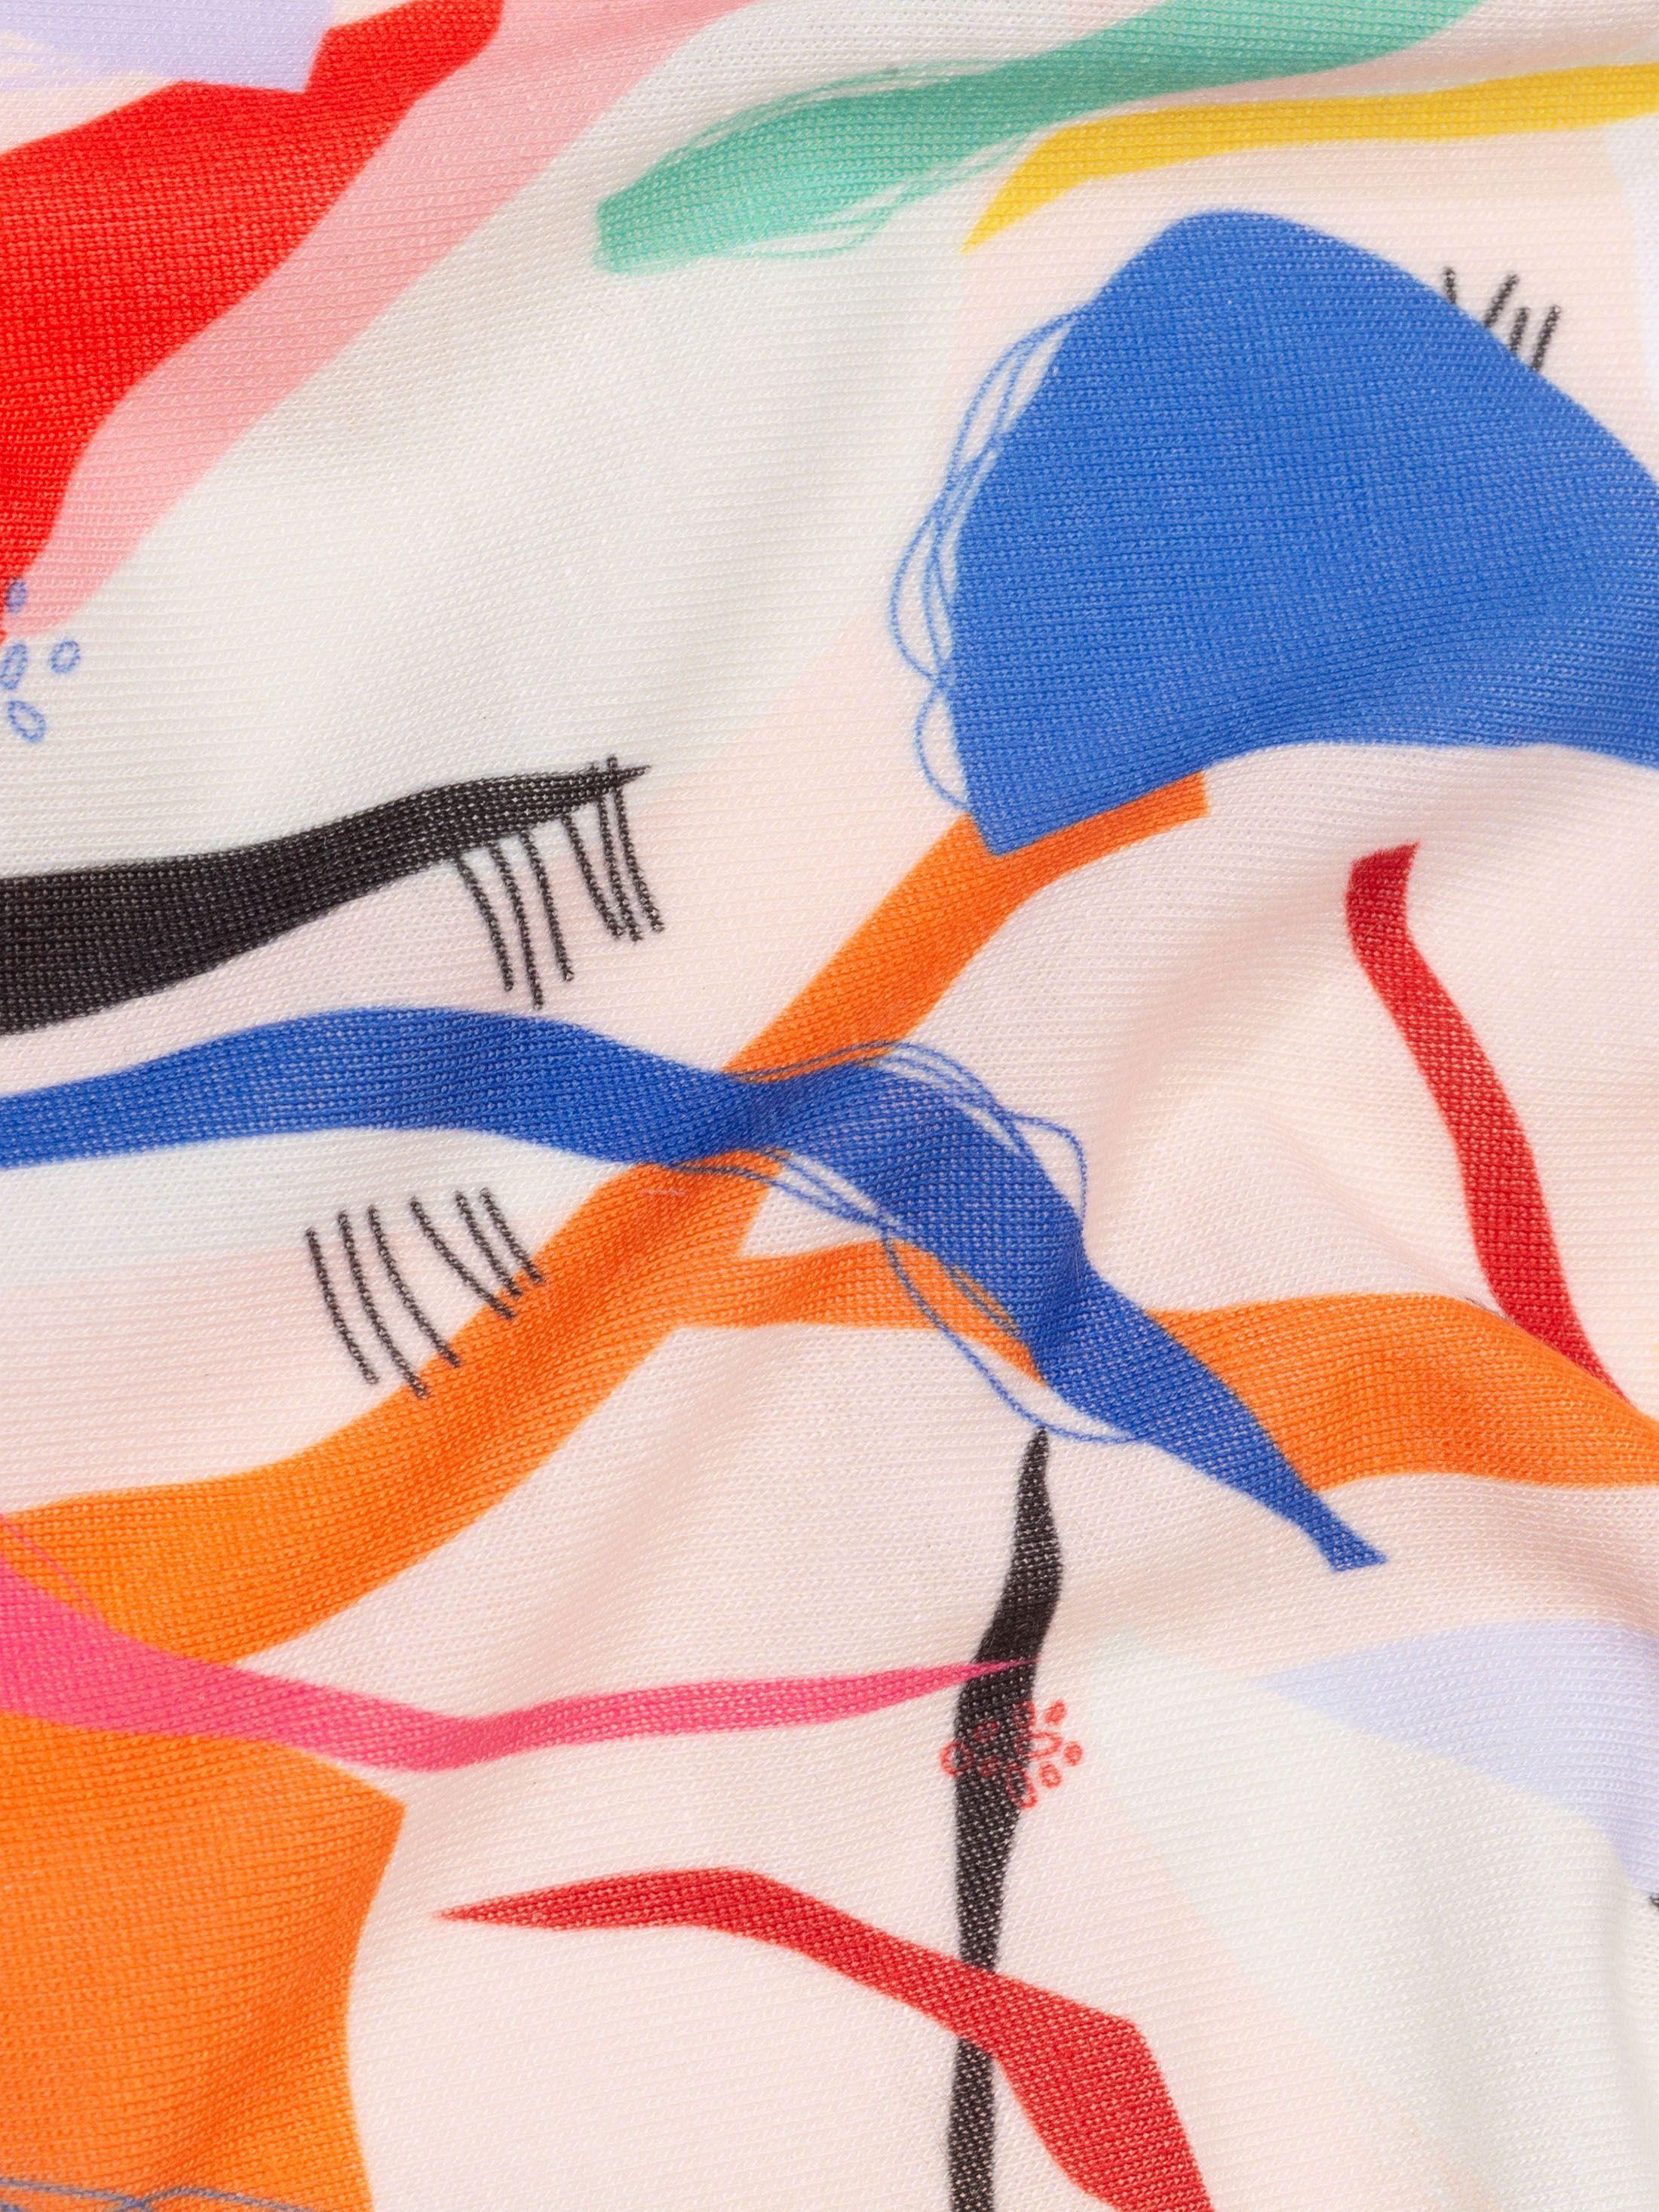 Impresión en algodón sintético jersey